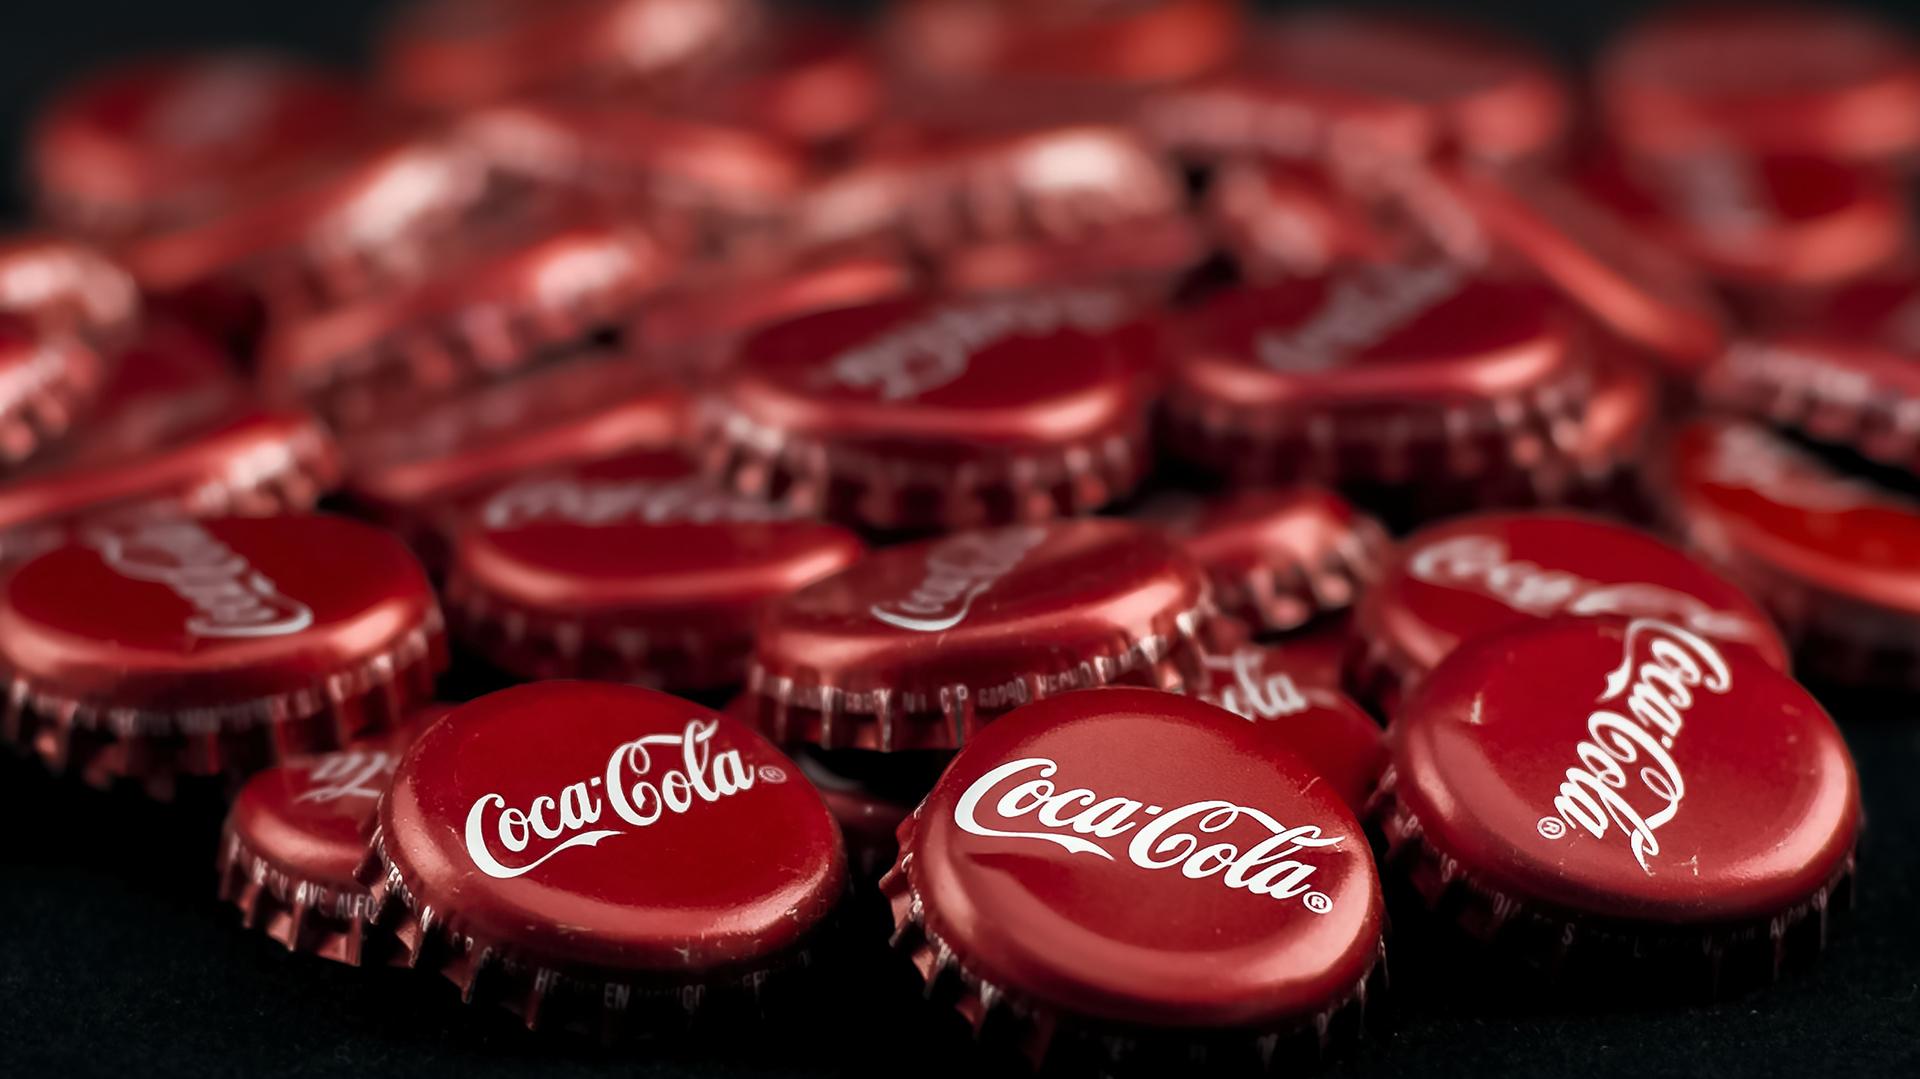 Hd Painting Wallpapers Download Download Free Coca Cola Backgrounds Pixelstalk Net